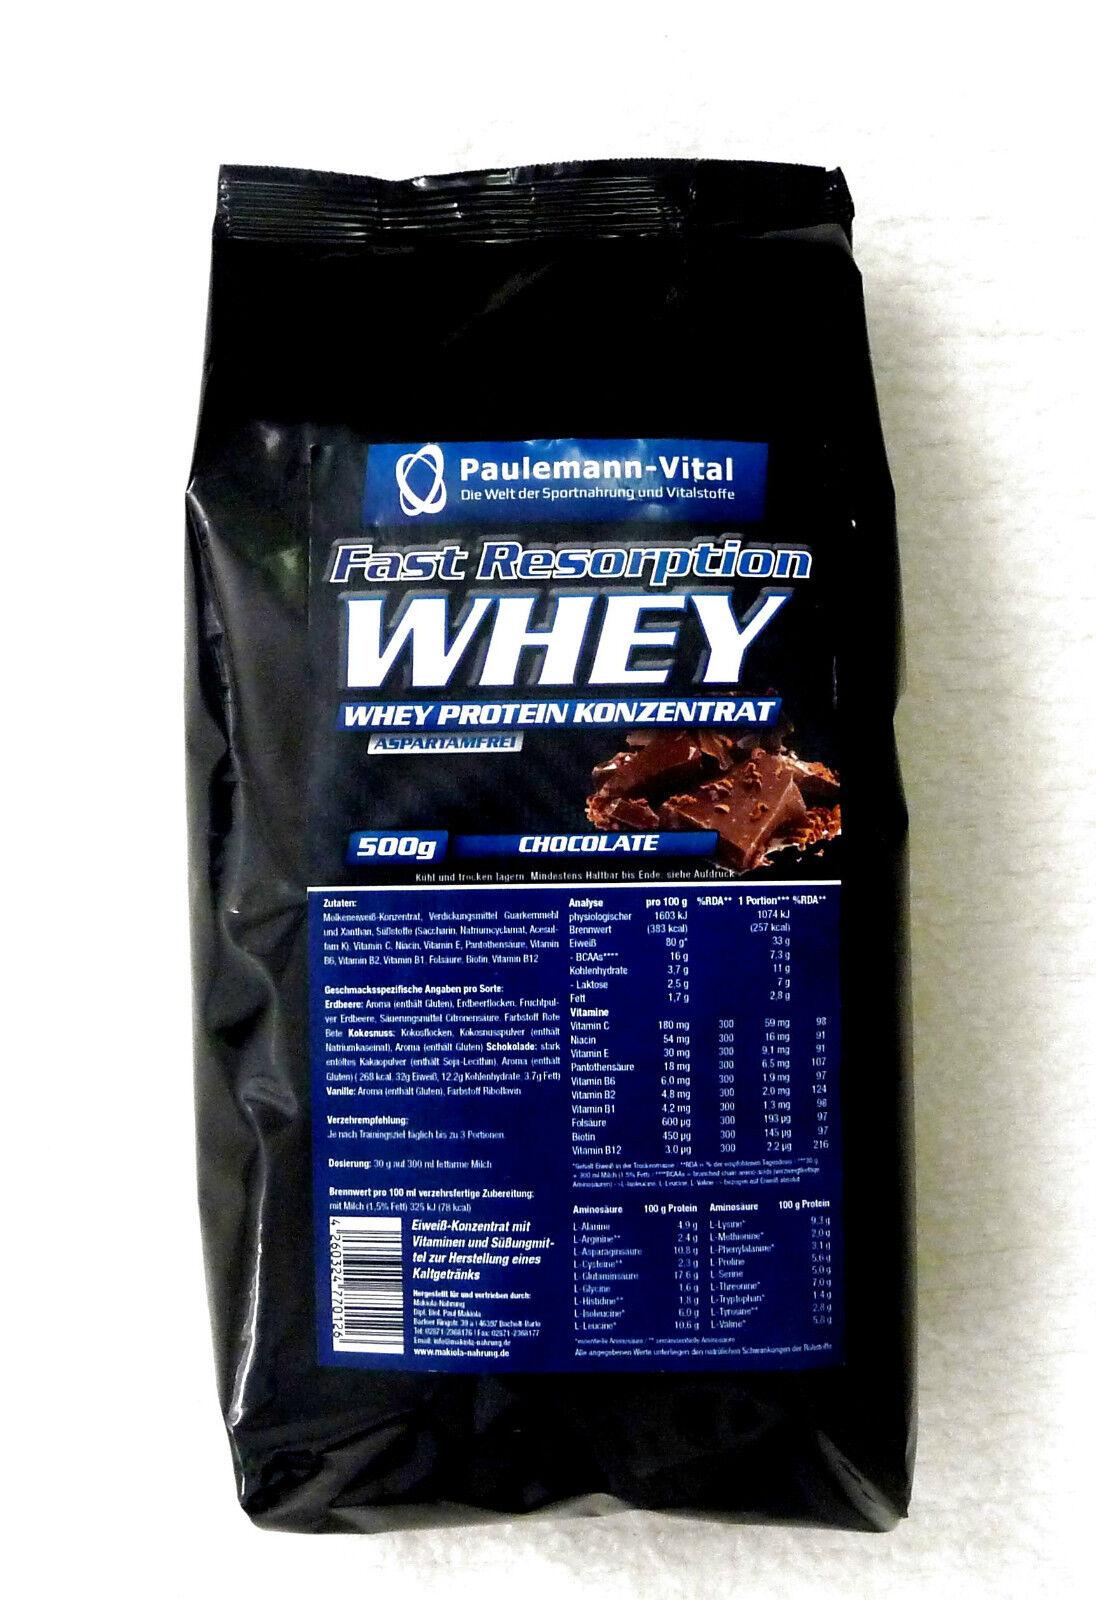 Fast Resorption Whey Paulemann-Vital 1500g dreifache Menge Eur 27,80/kg